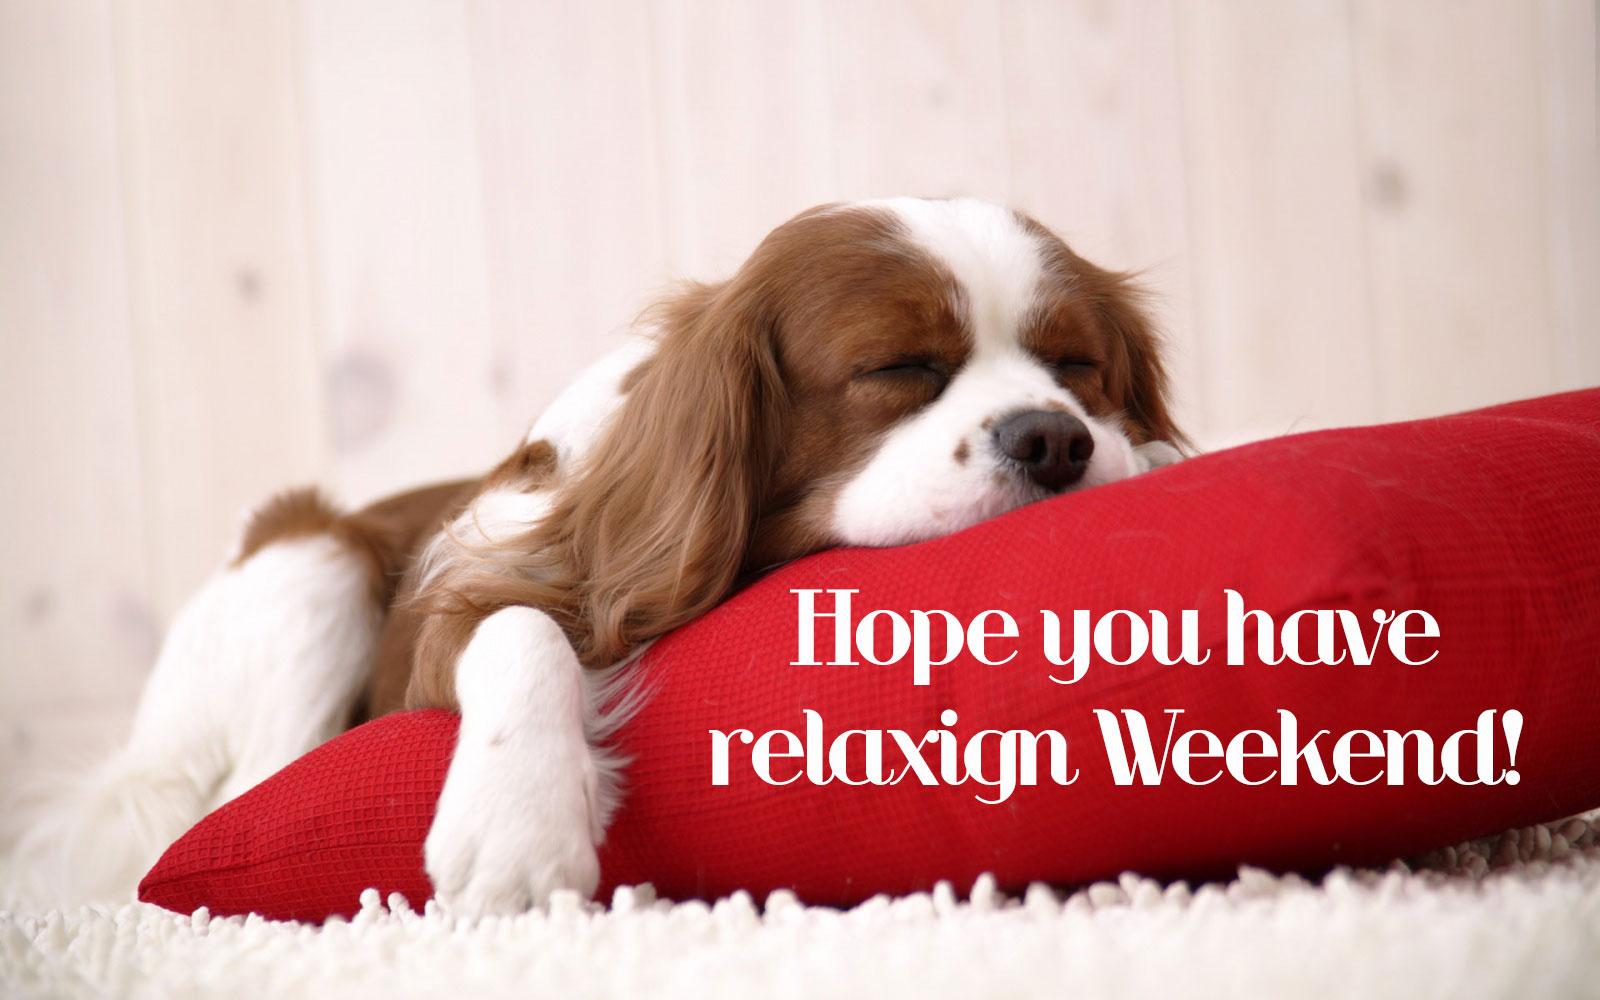 Resultado de imagem para relaxing weekend